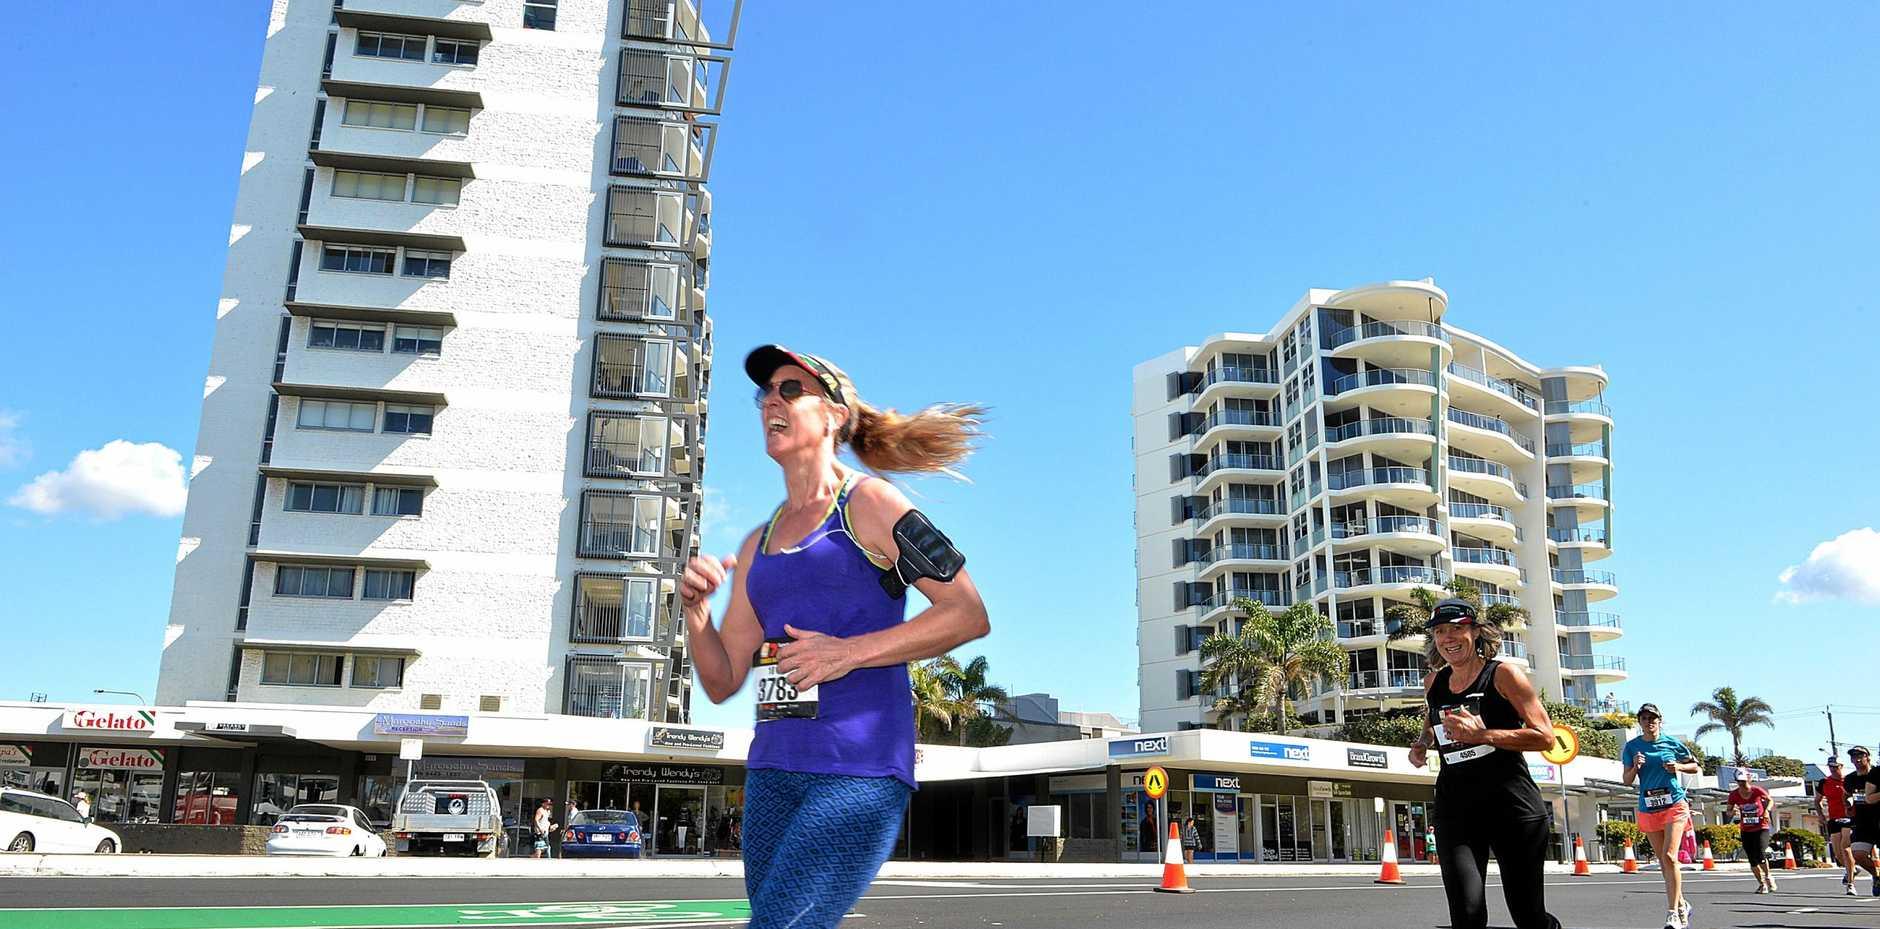 Action from the Sunshine Coast Marathon.